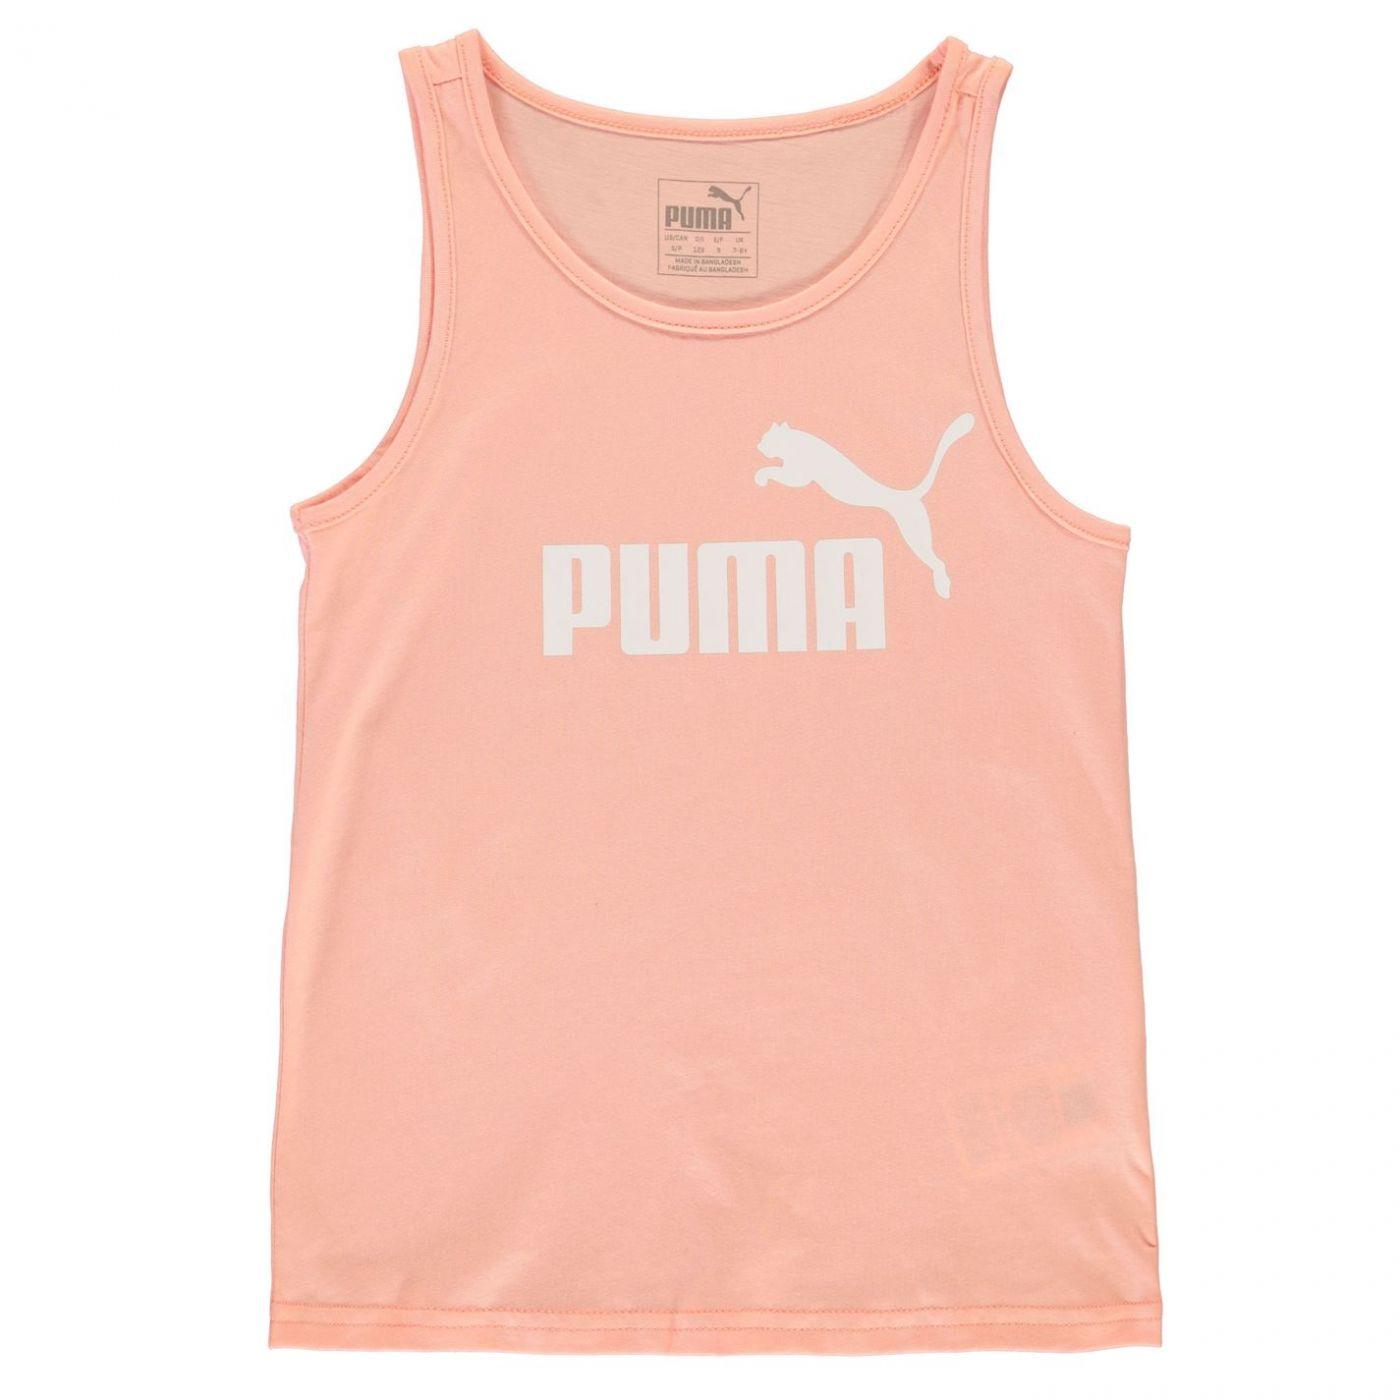 Puma Logo Tank Top Junior Girls